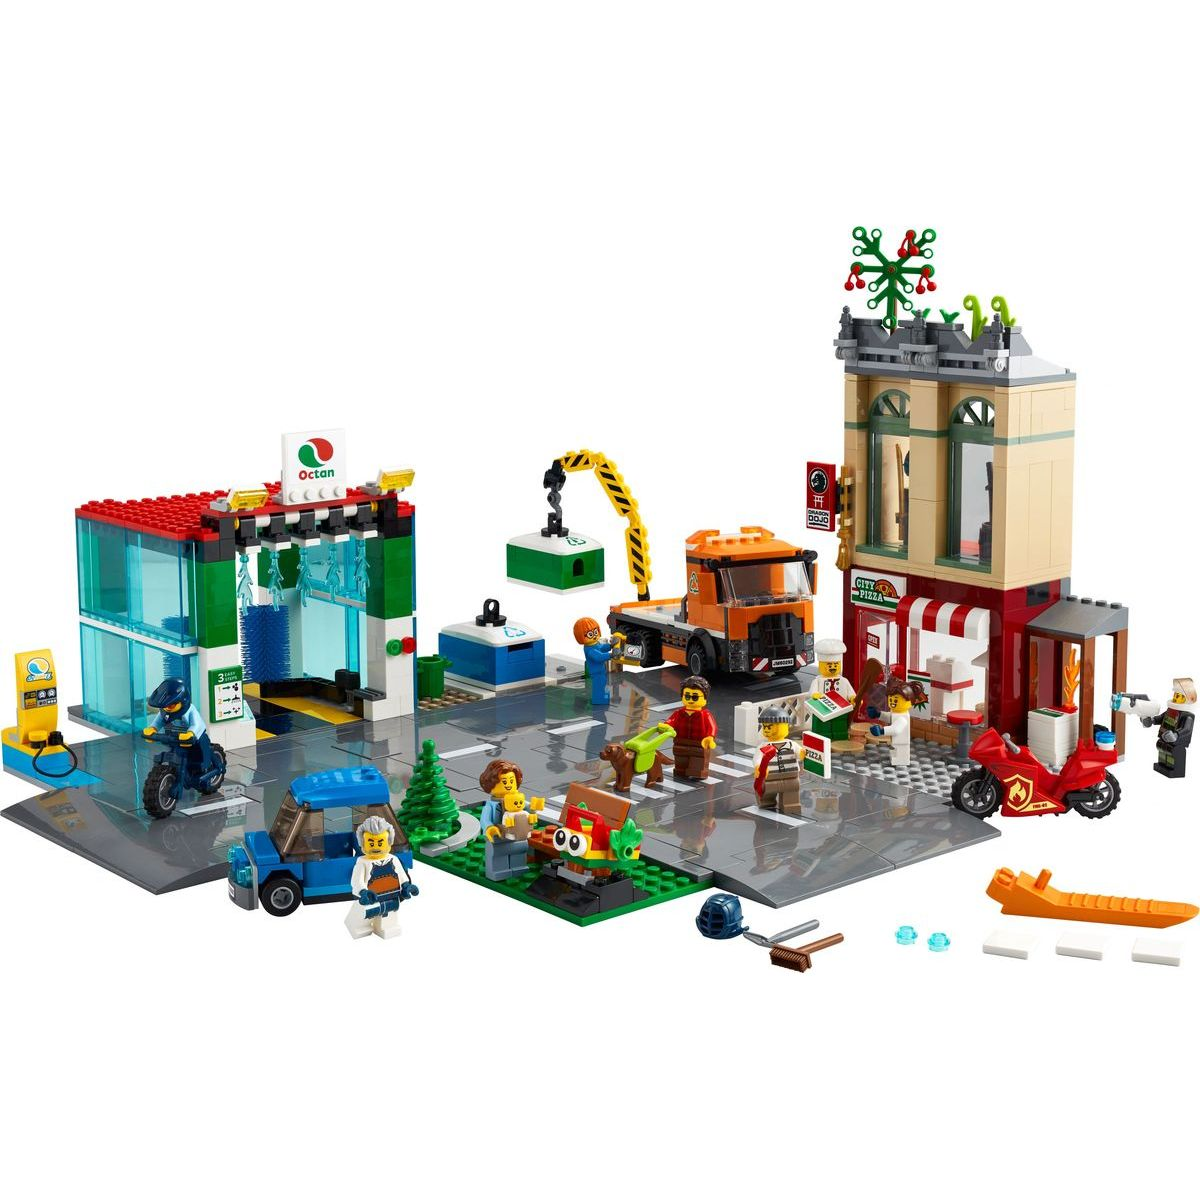 LEGO City 60292 Centrum mestečka